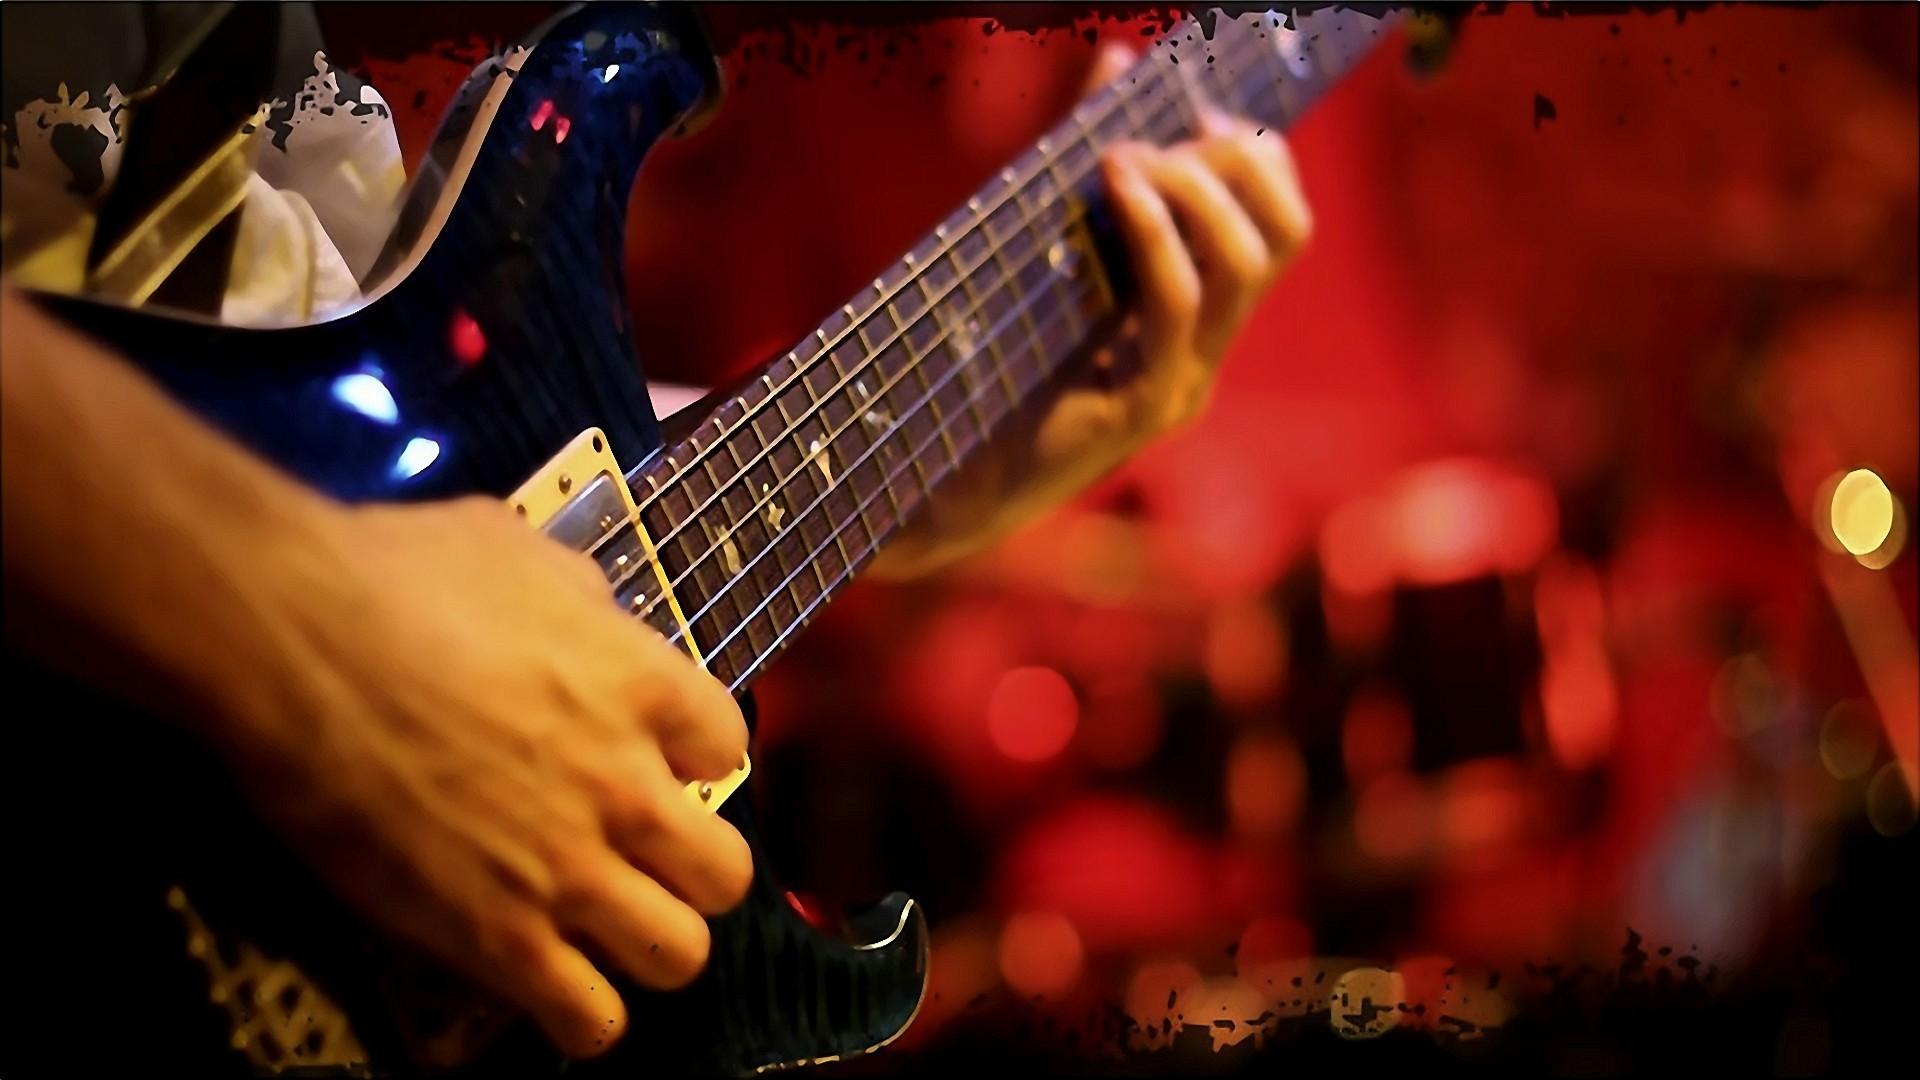 1920x1080 Music Guitar Wallpapers Group 1024A 768 3D 49